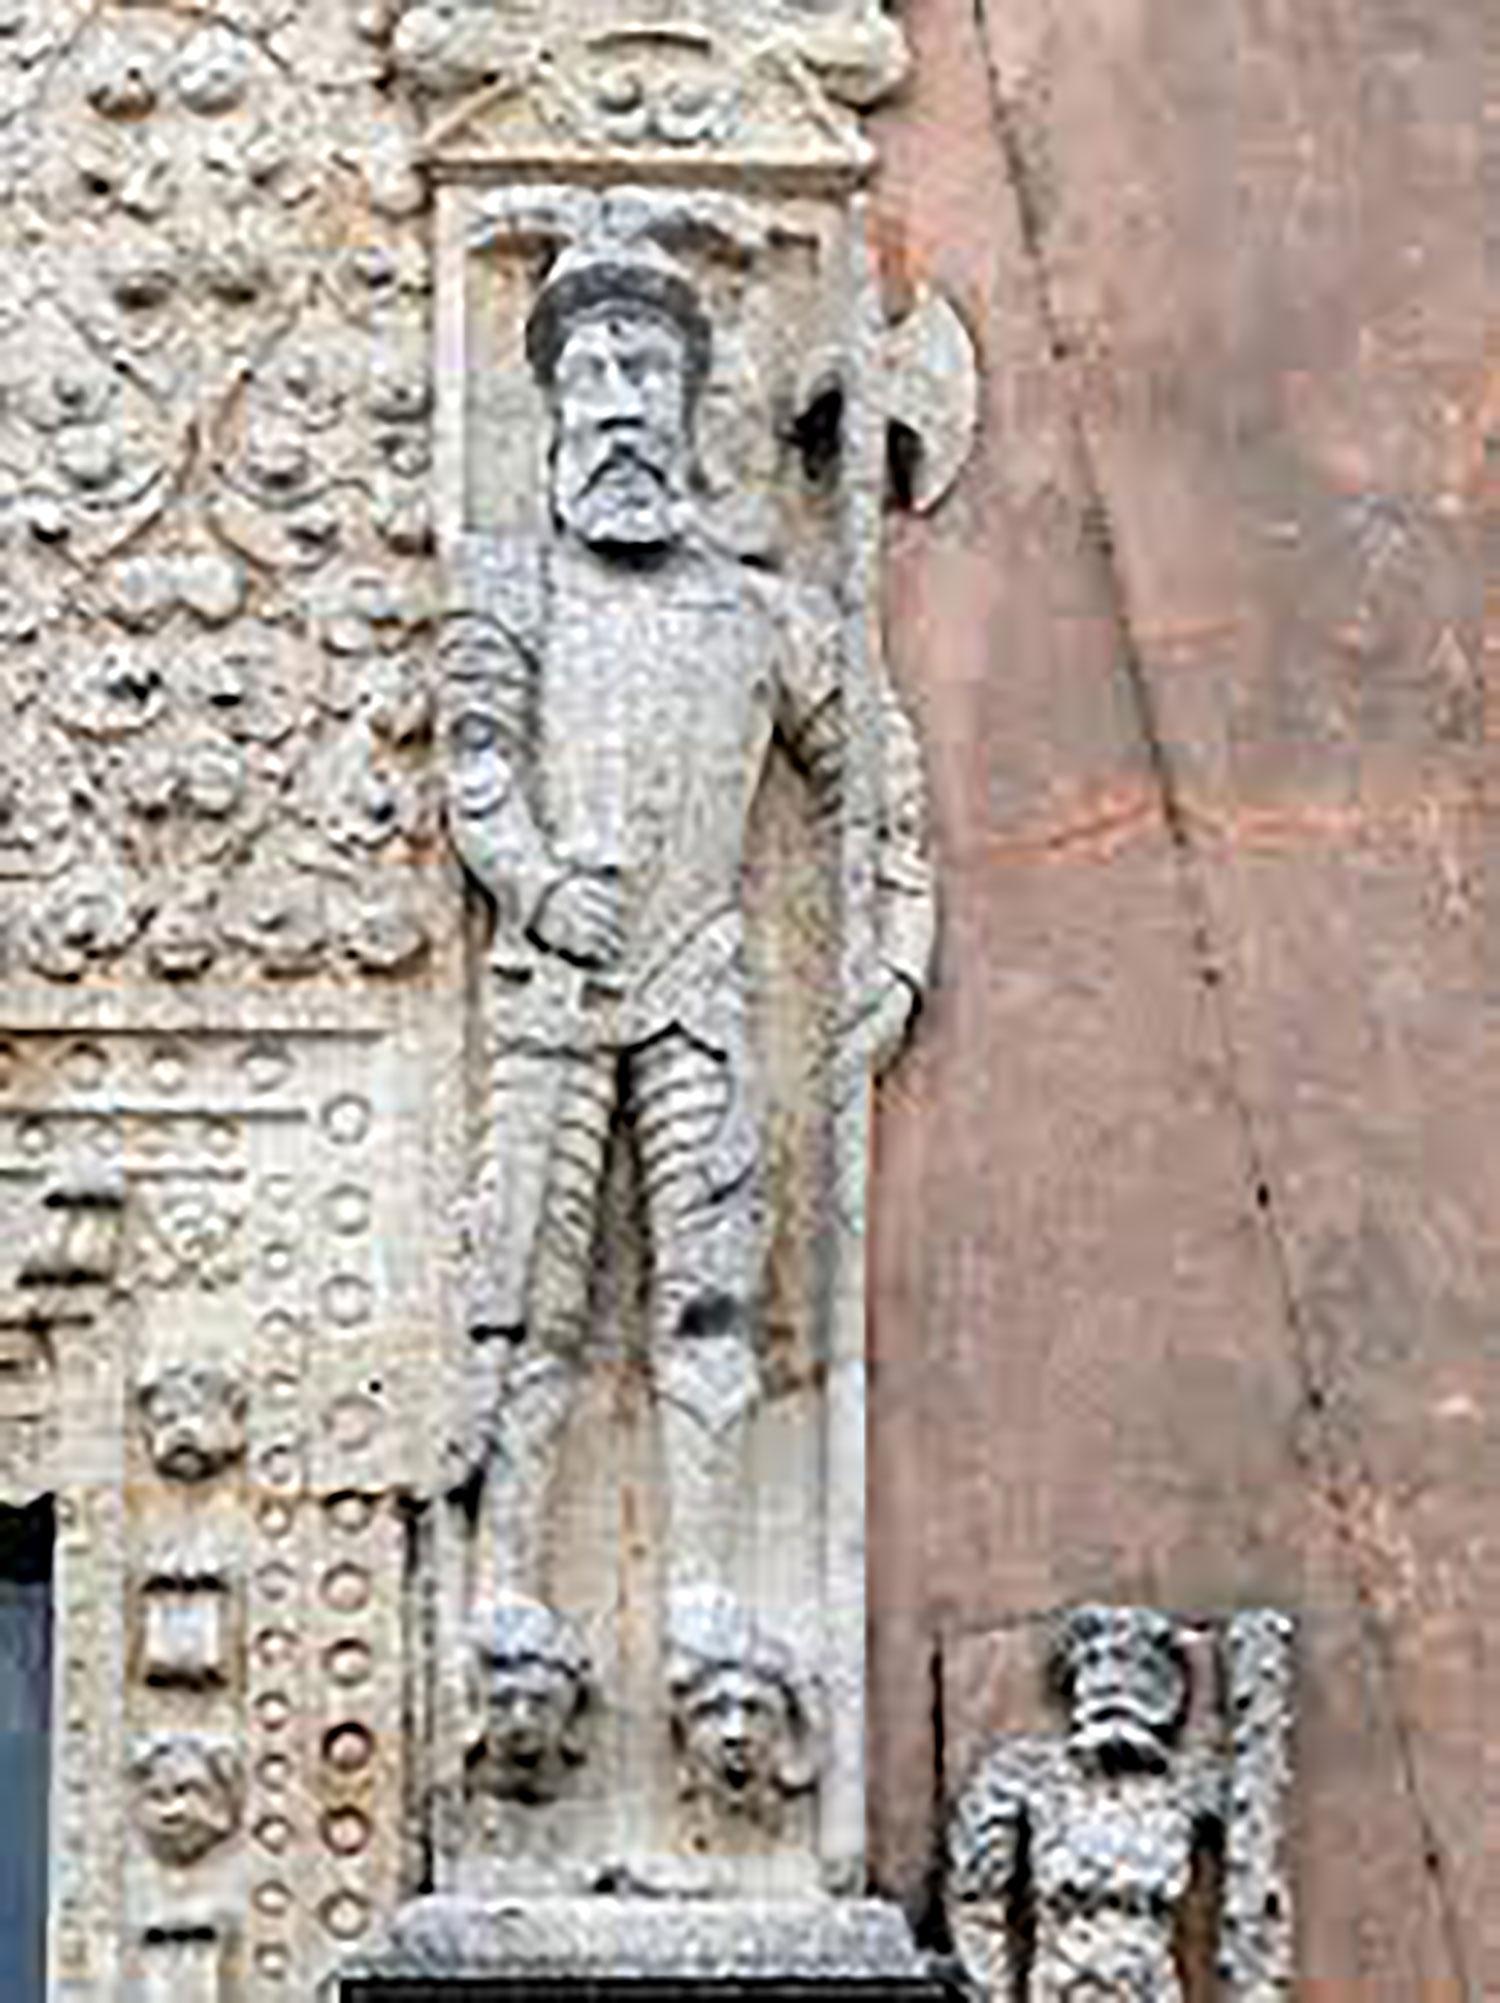 Spanish halberdier on the façade of the house.